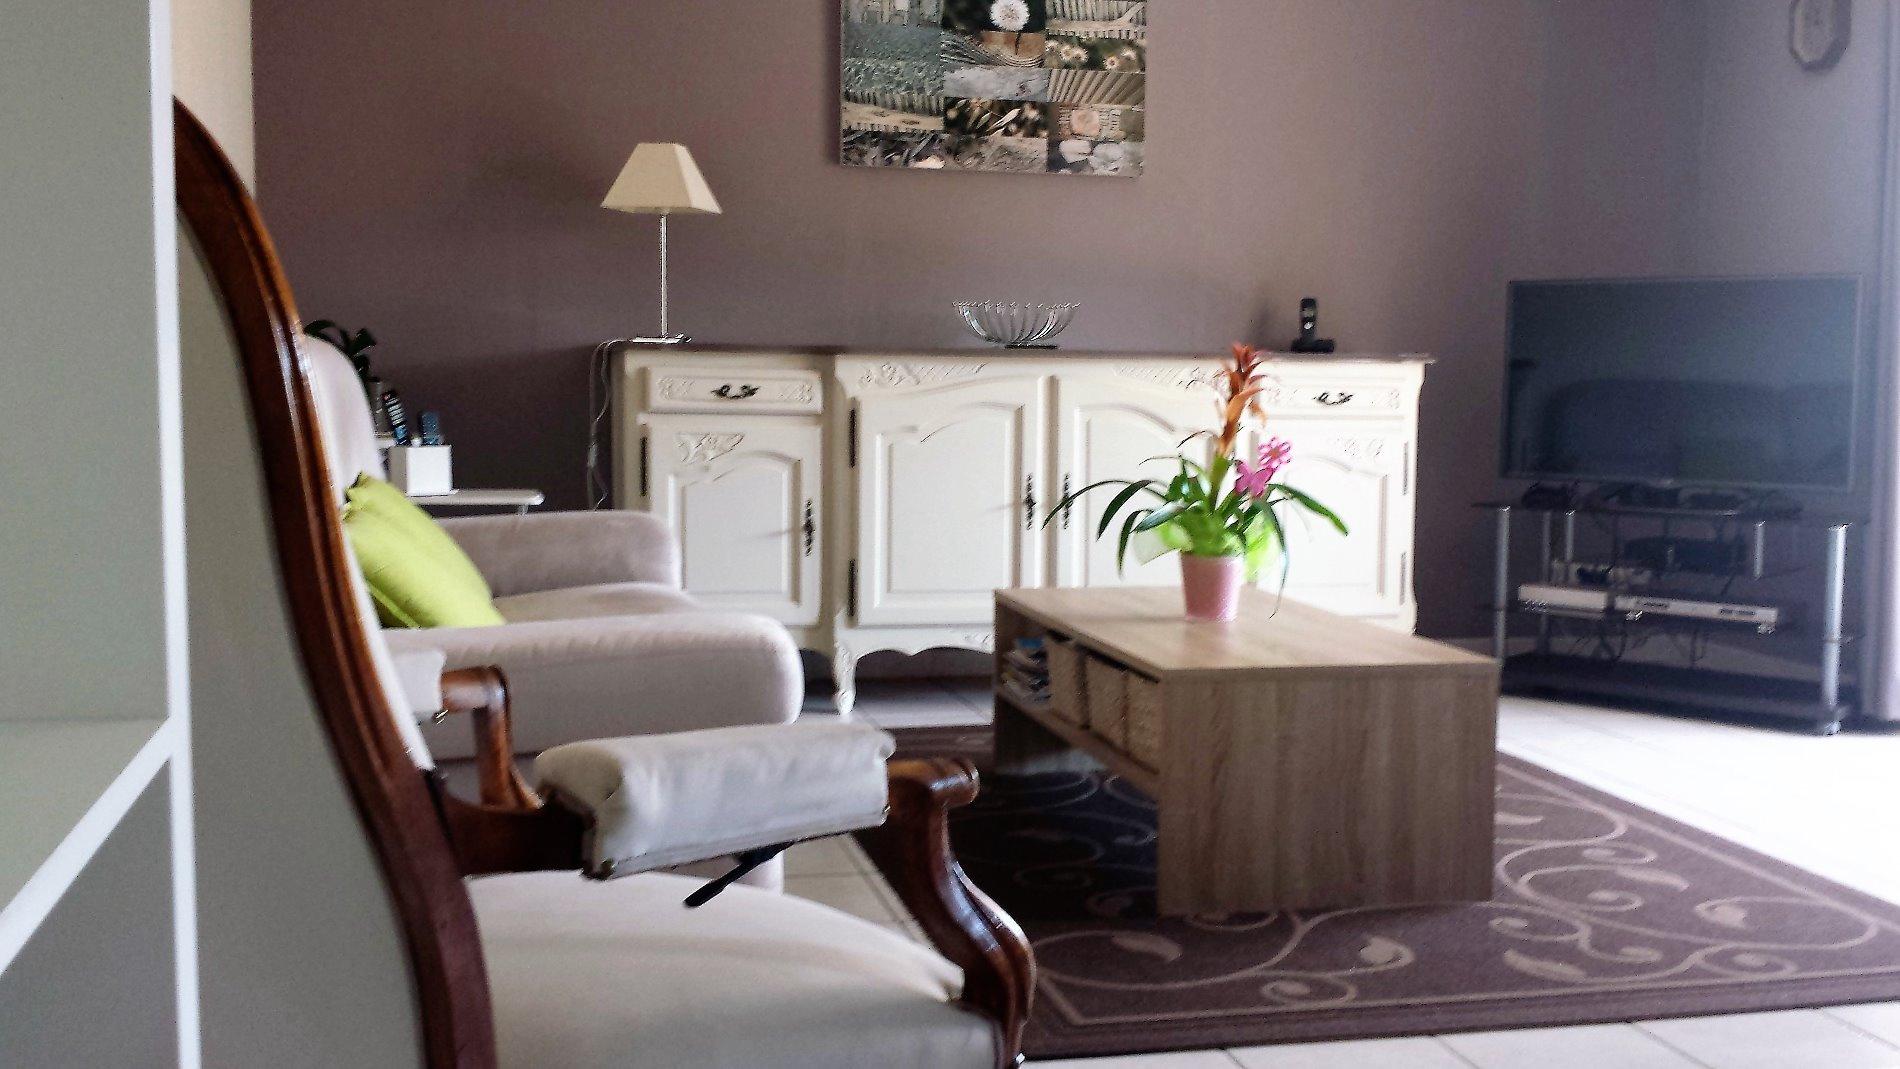 annonce vente appartement aubagne 13400 64 m 223 000. Black Bedroom Furniture Sets. Home Design Ideas